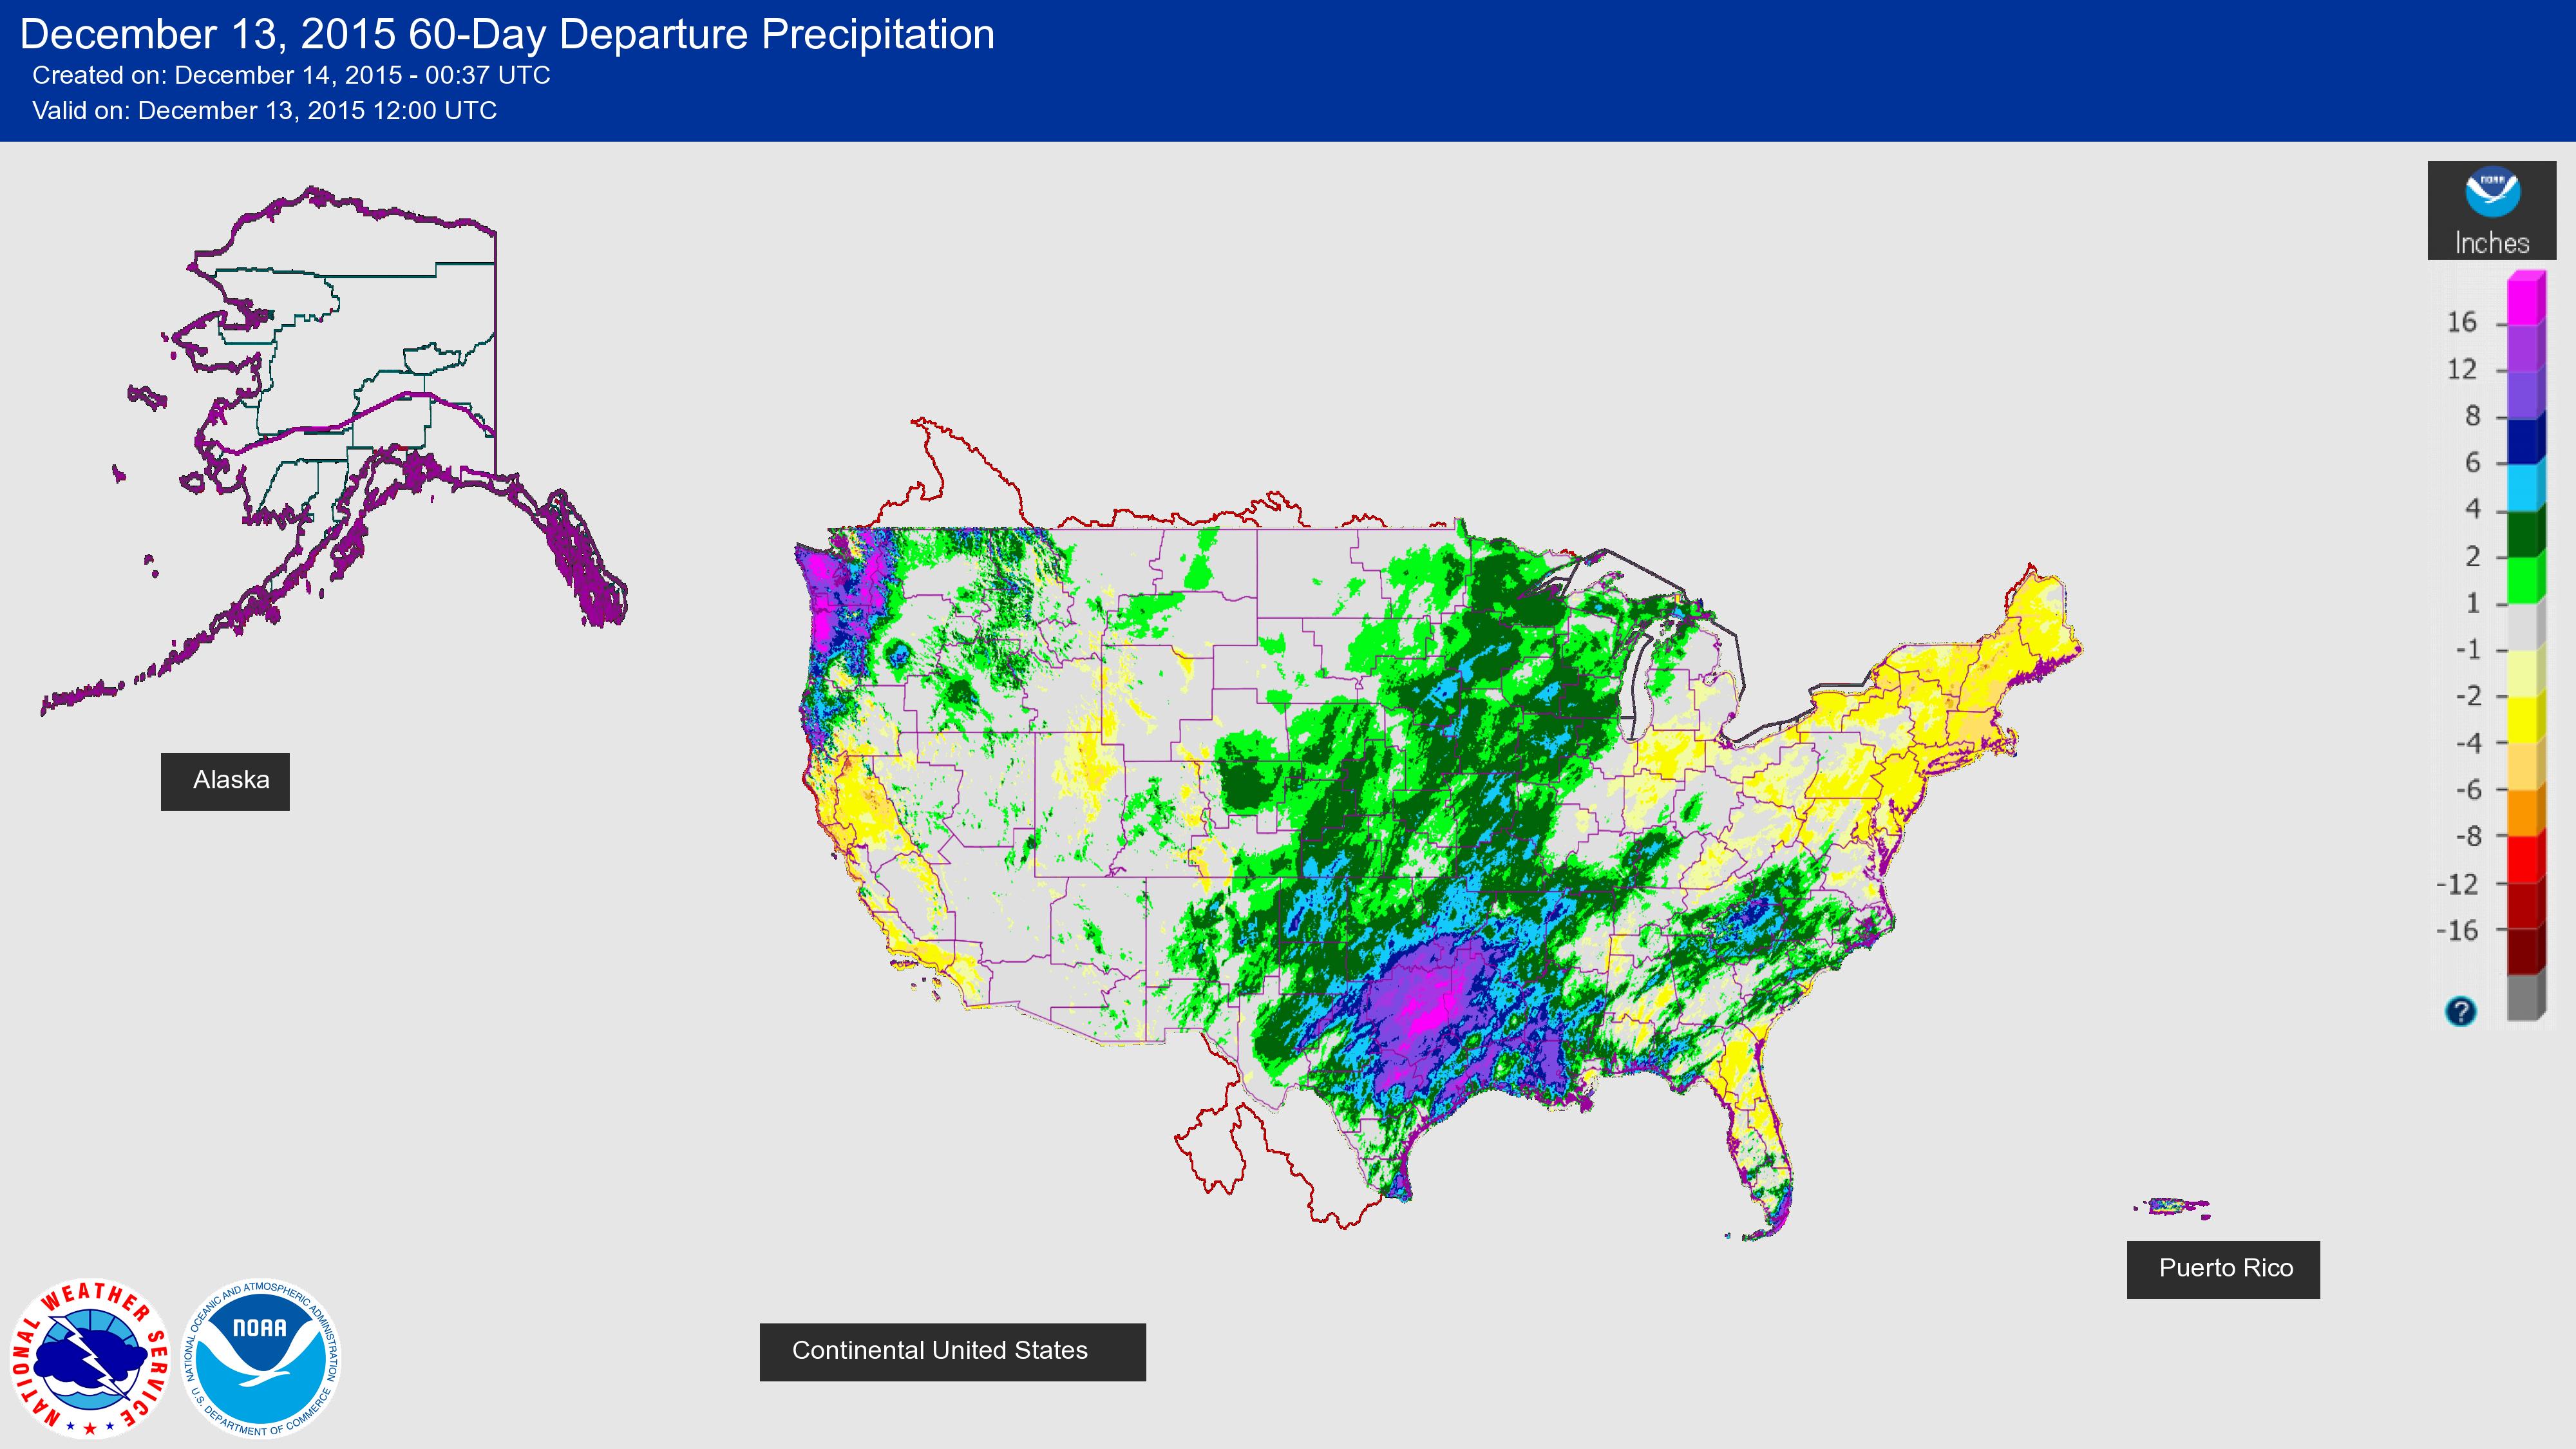 December 13, 2015 60-Day Departure Precipitation